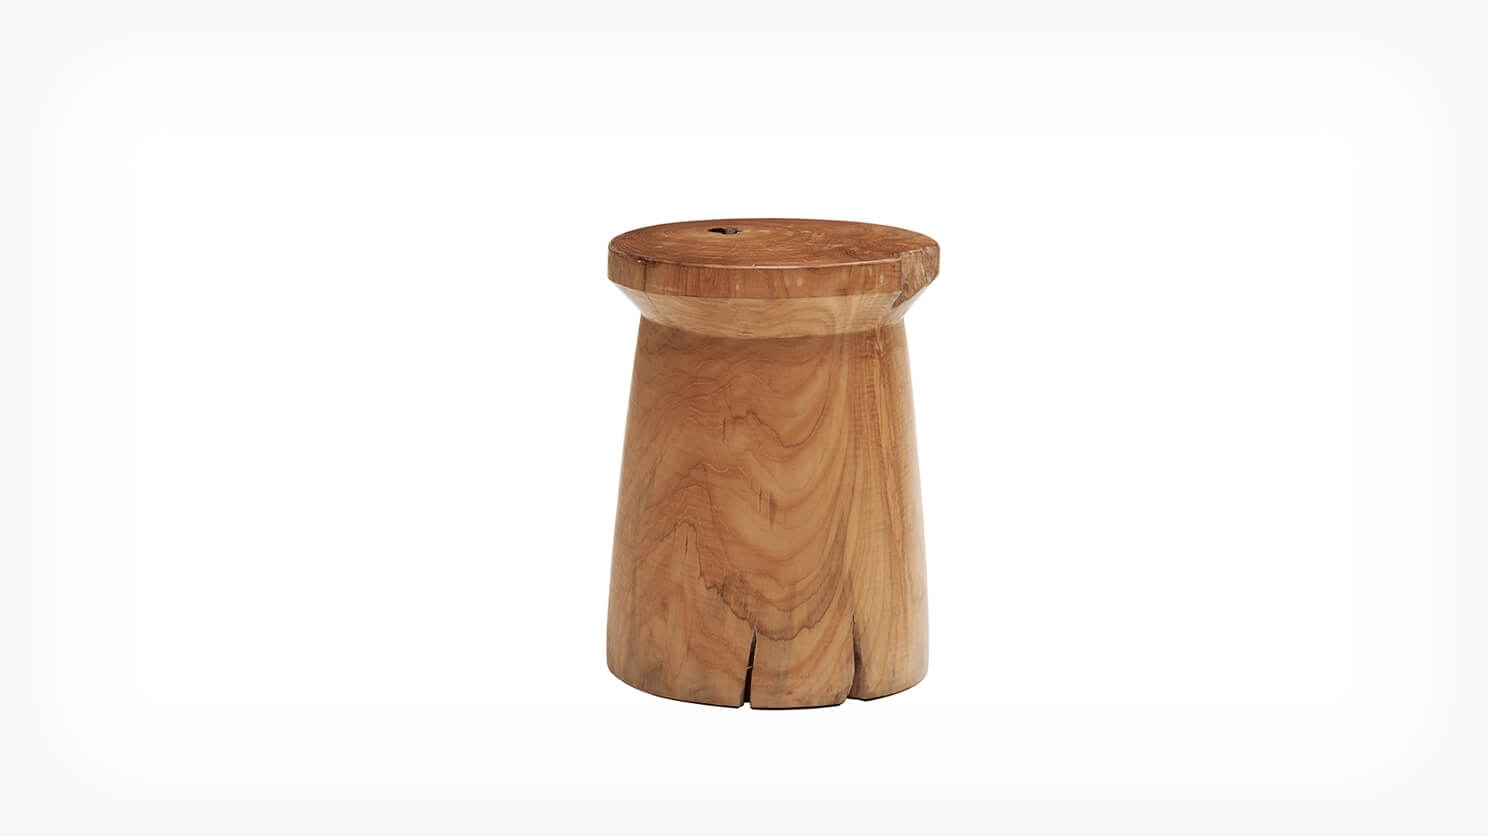 Solid Teak Wood Stool - Round | EQ3